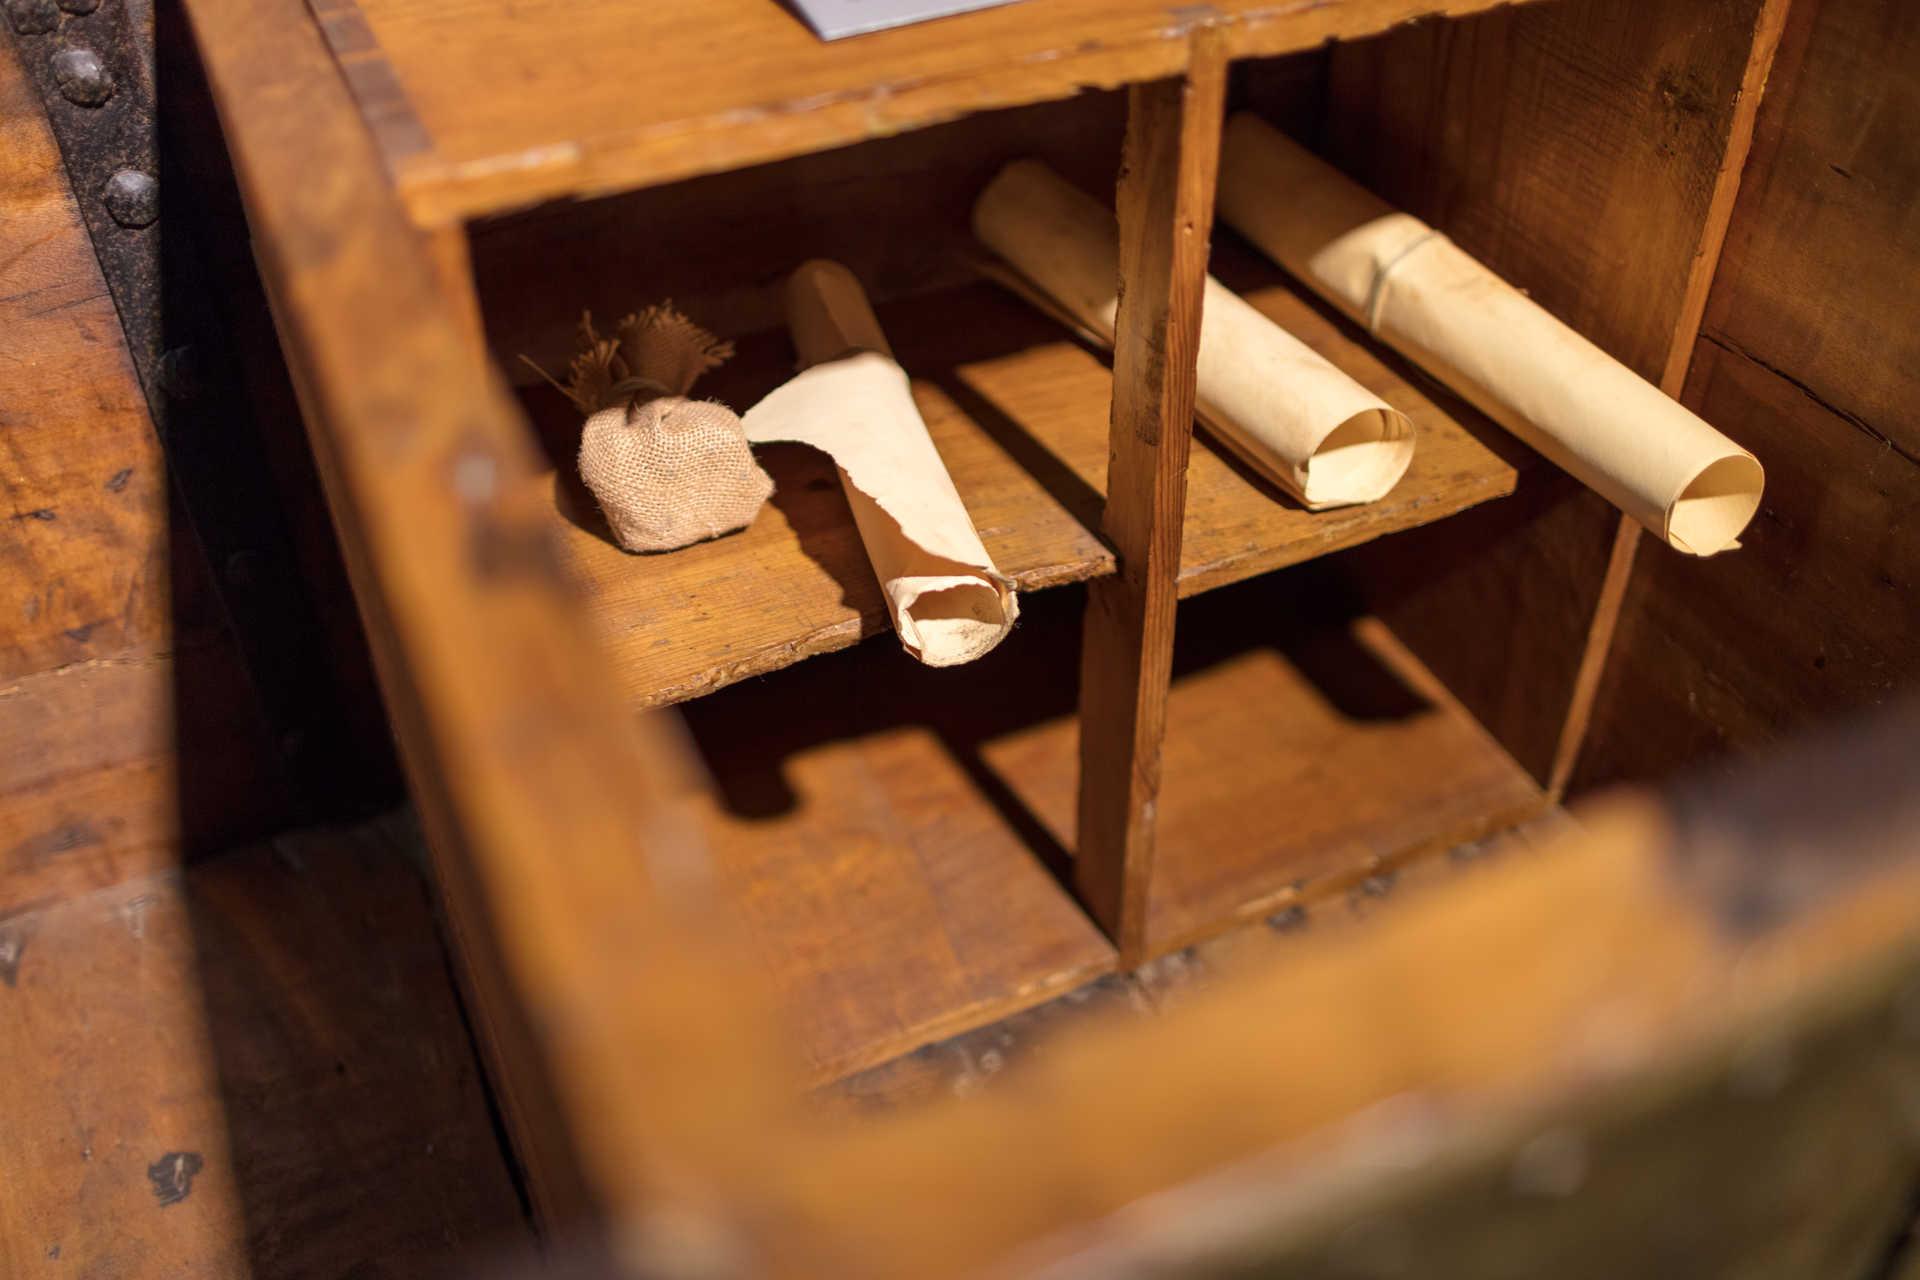 Municipal arqueological, ethnological and paleontological museum